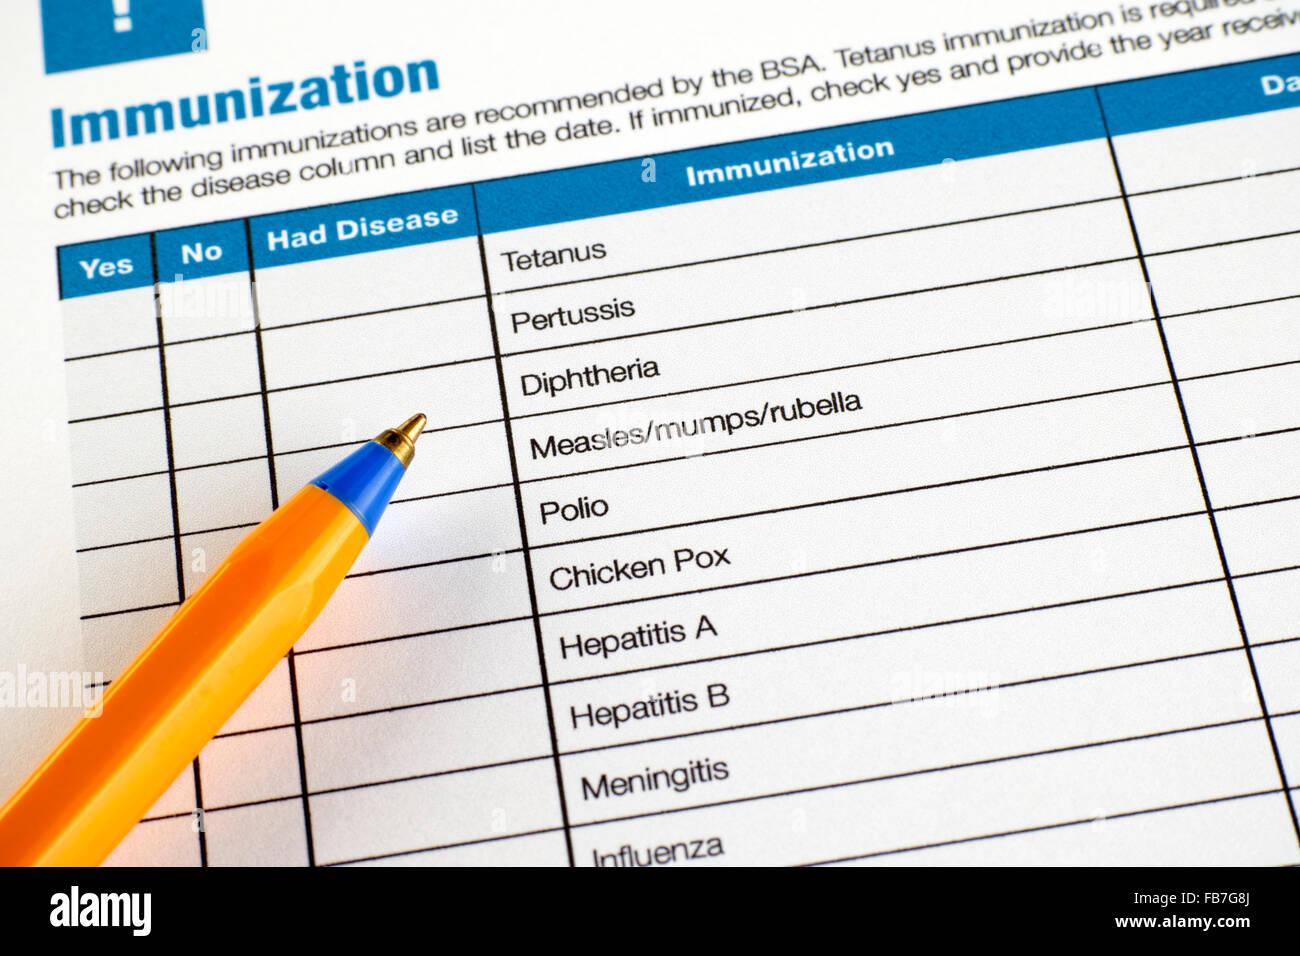 Formulario de solicitud de inmunización con bolígrafo. Imagen De Stock